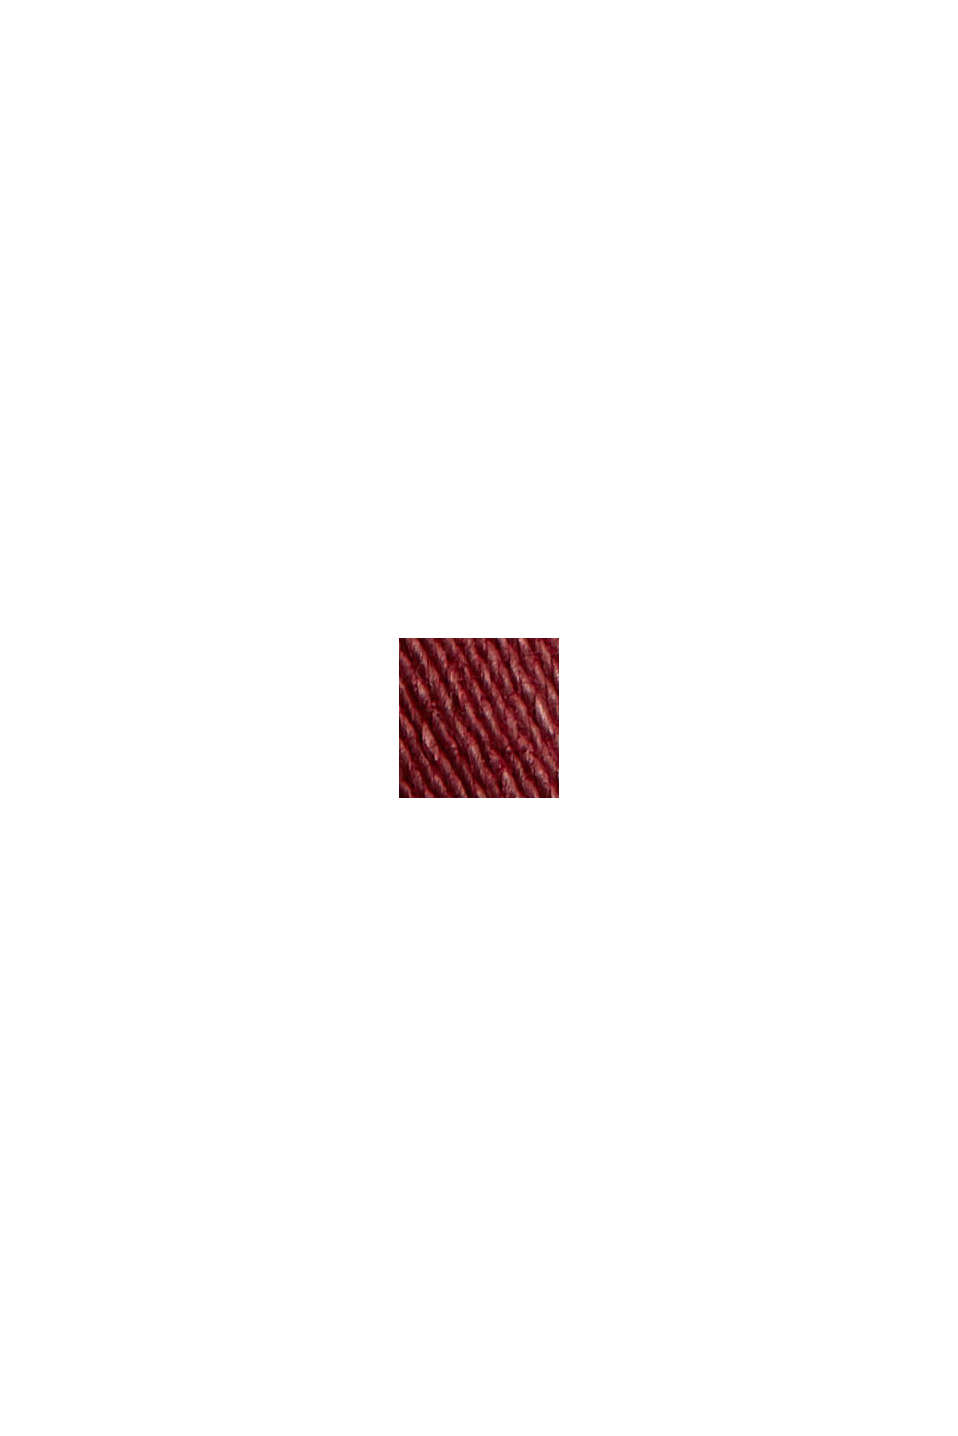 Pantaloni skinny con cotone biologico, BORDEAUX RED, swatch